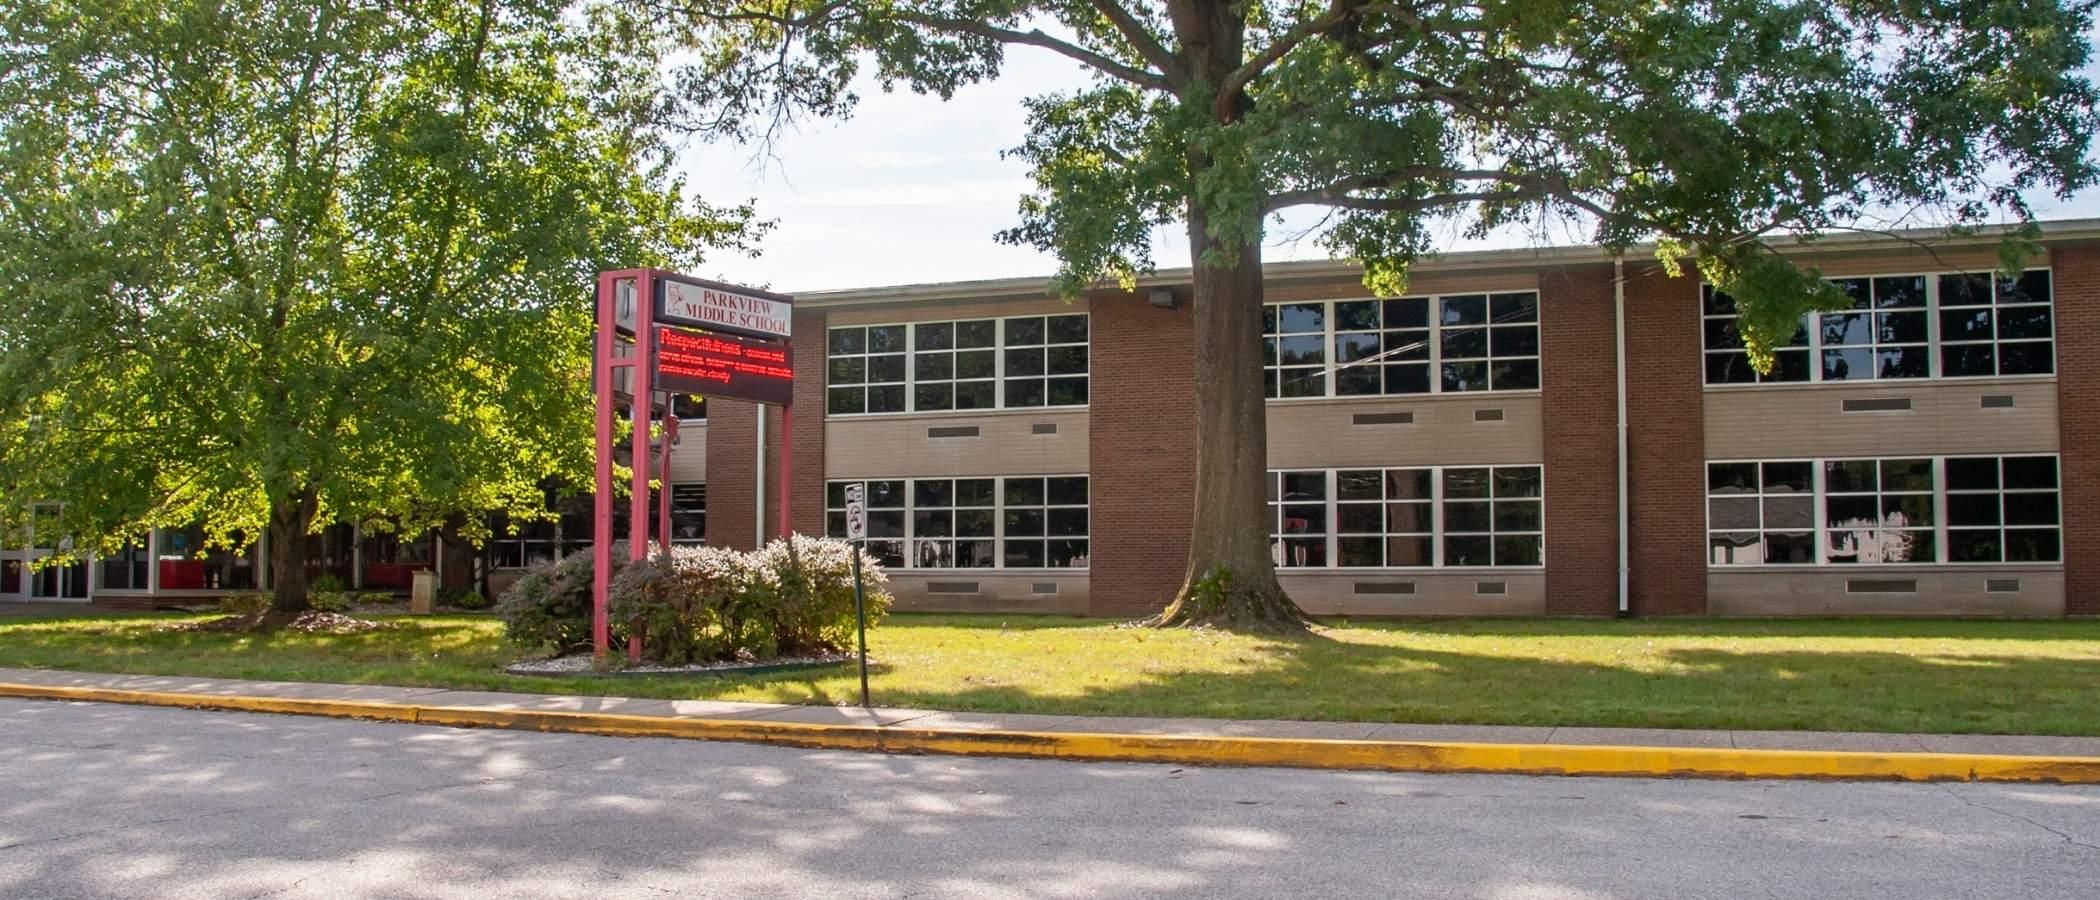 Parkview Middle School exterior